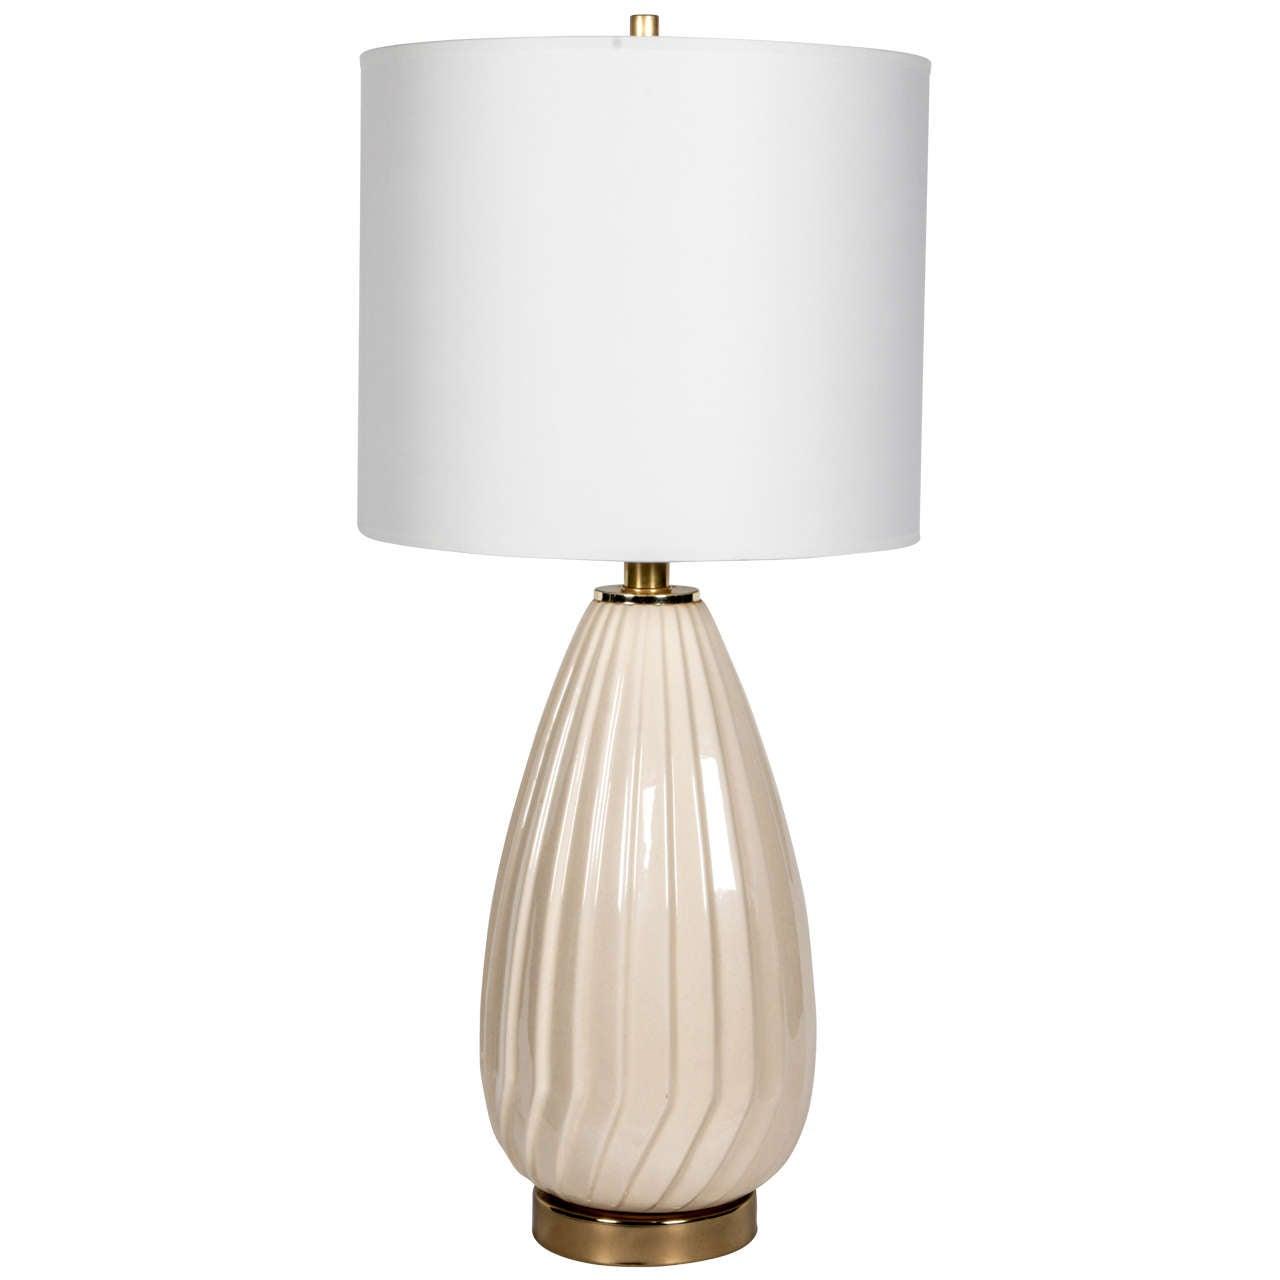 1960s Italian Ribbed Glass Table Lamp